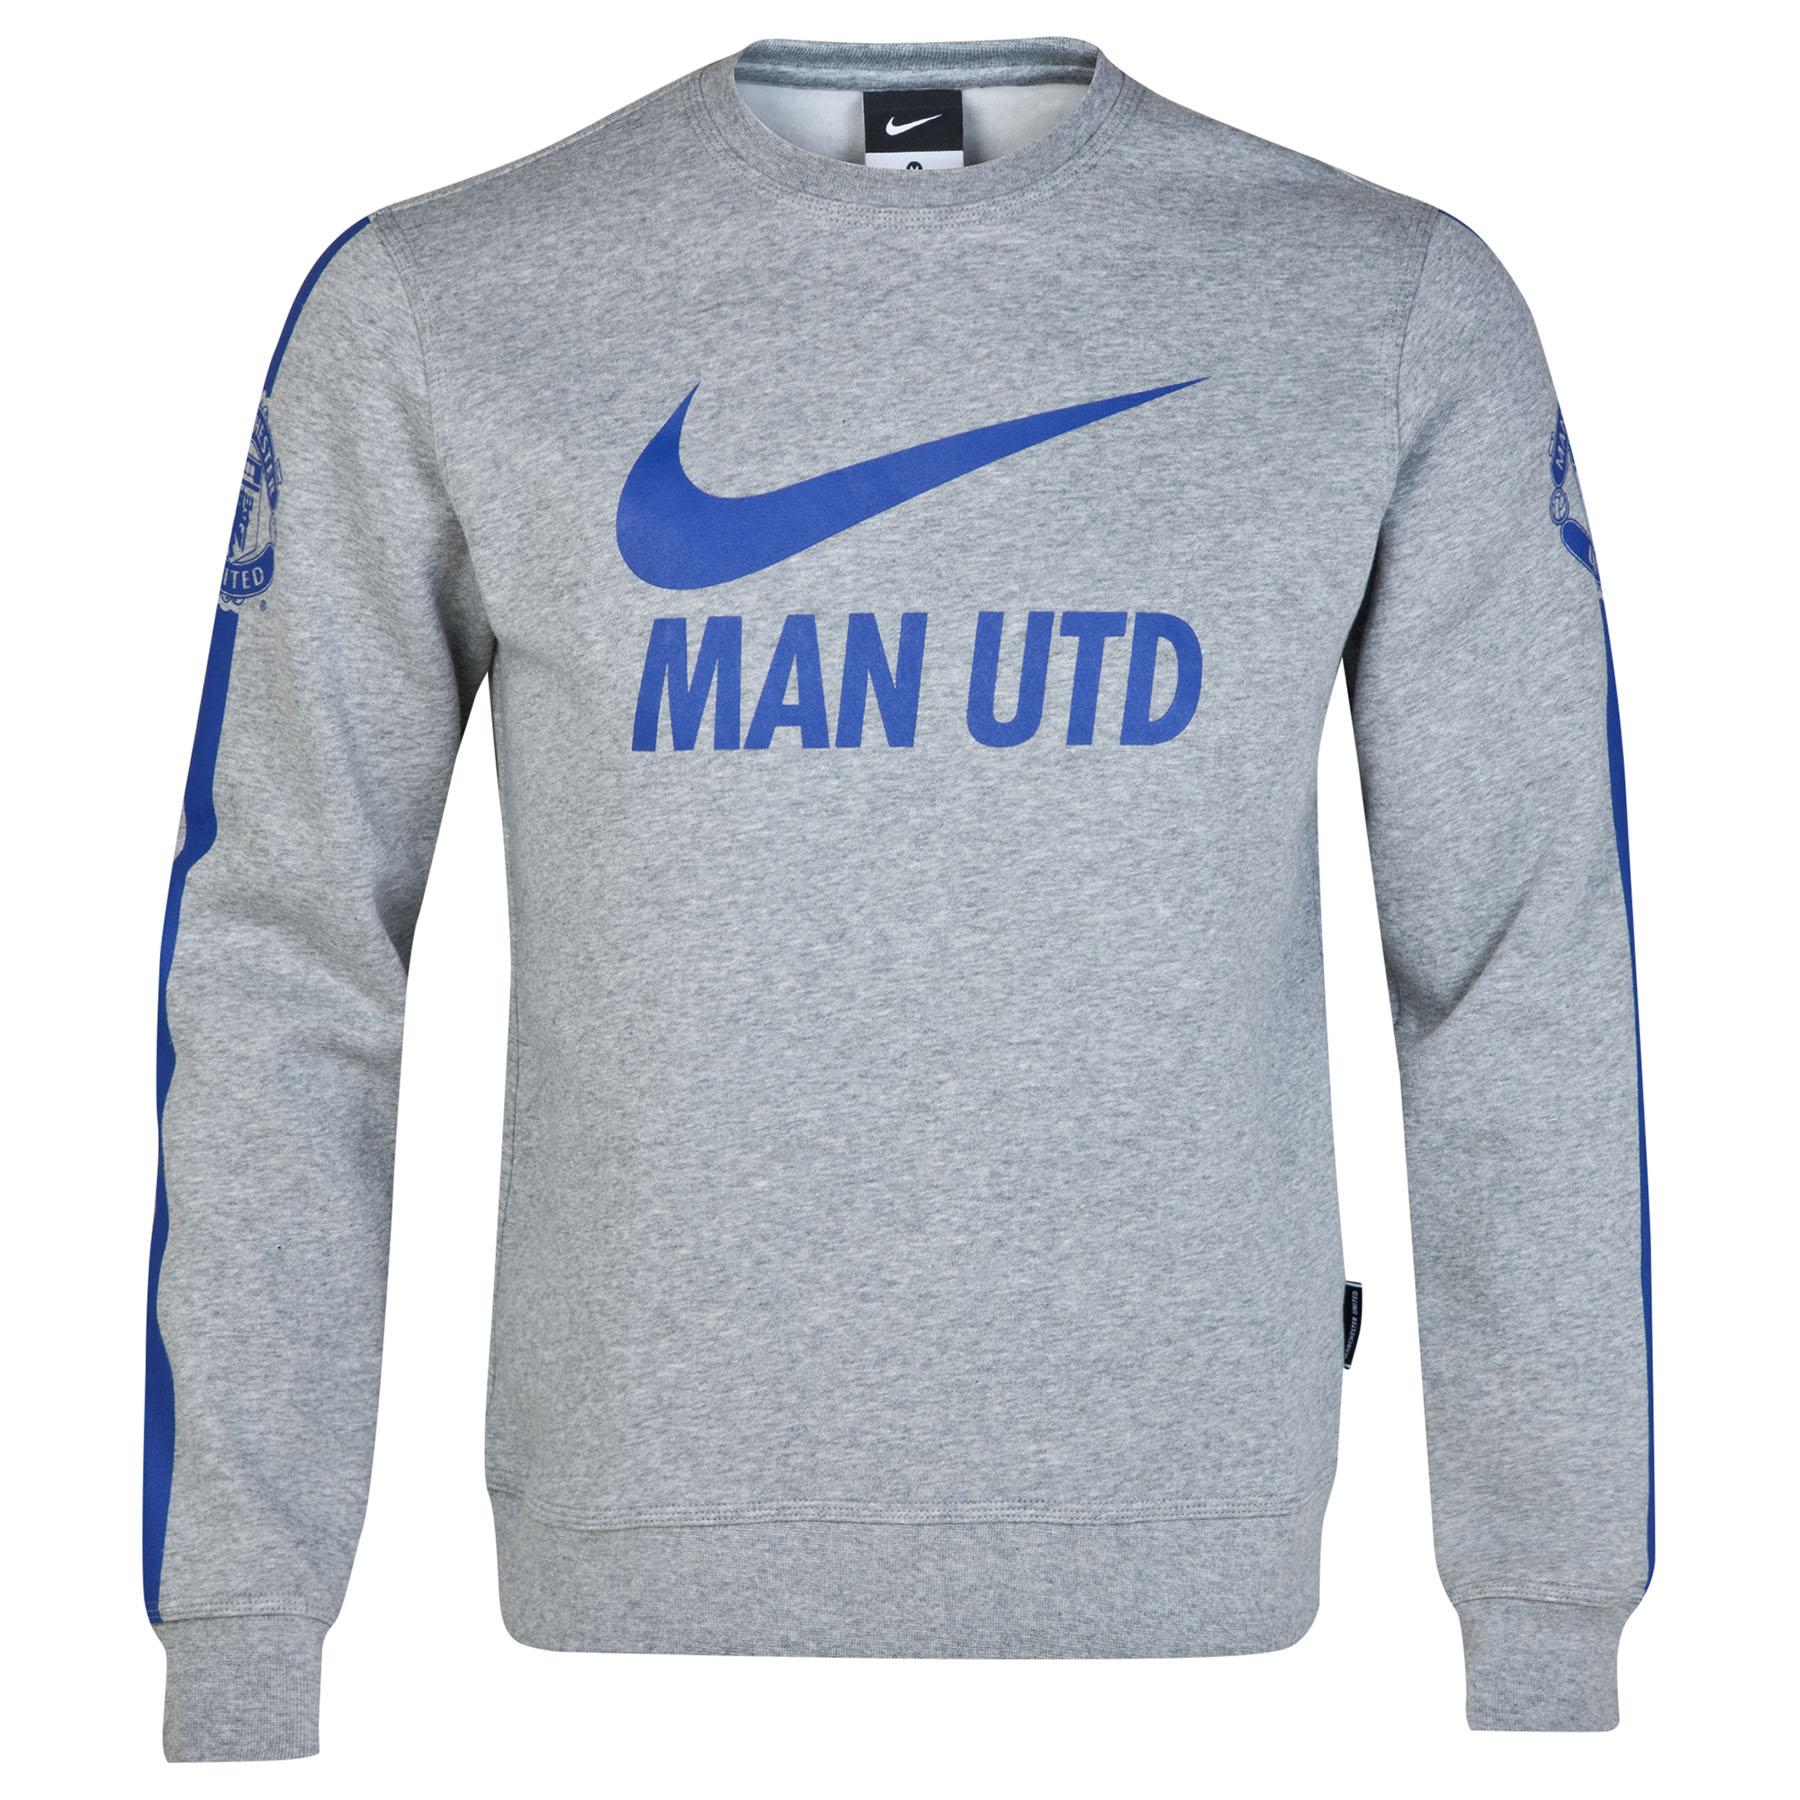 Manchester United Core Long Sleeve Crew Sweatshirt